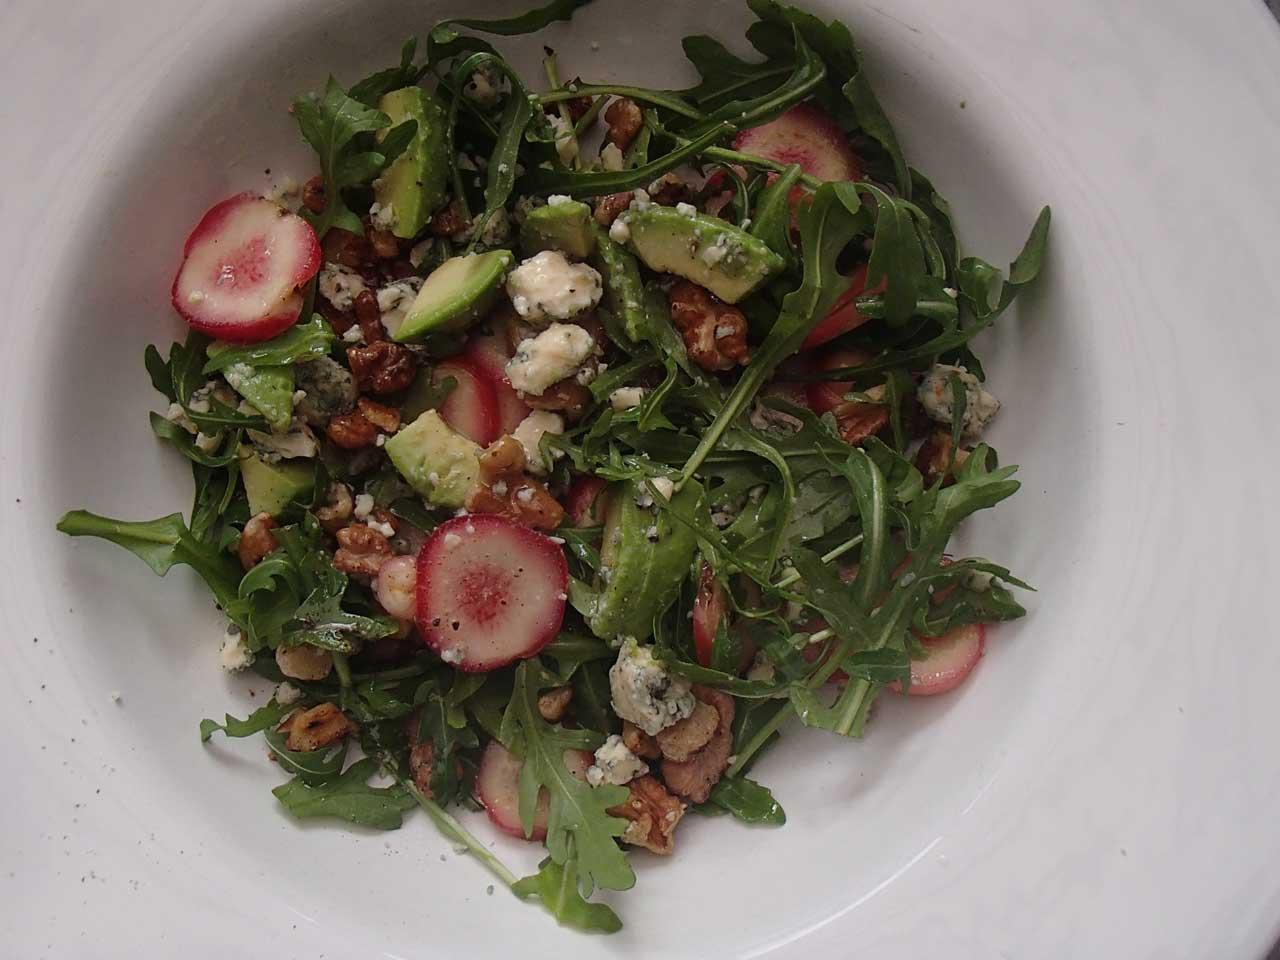 oca-in-salad